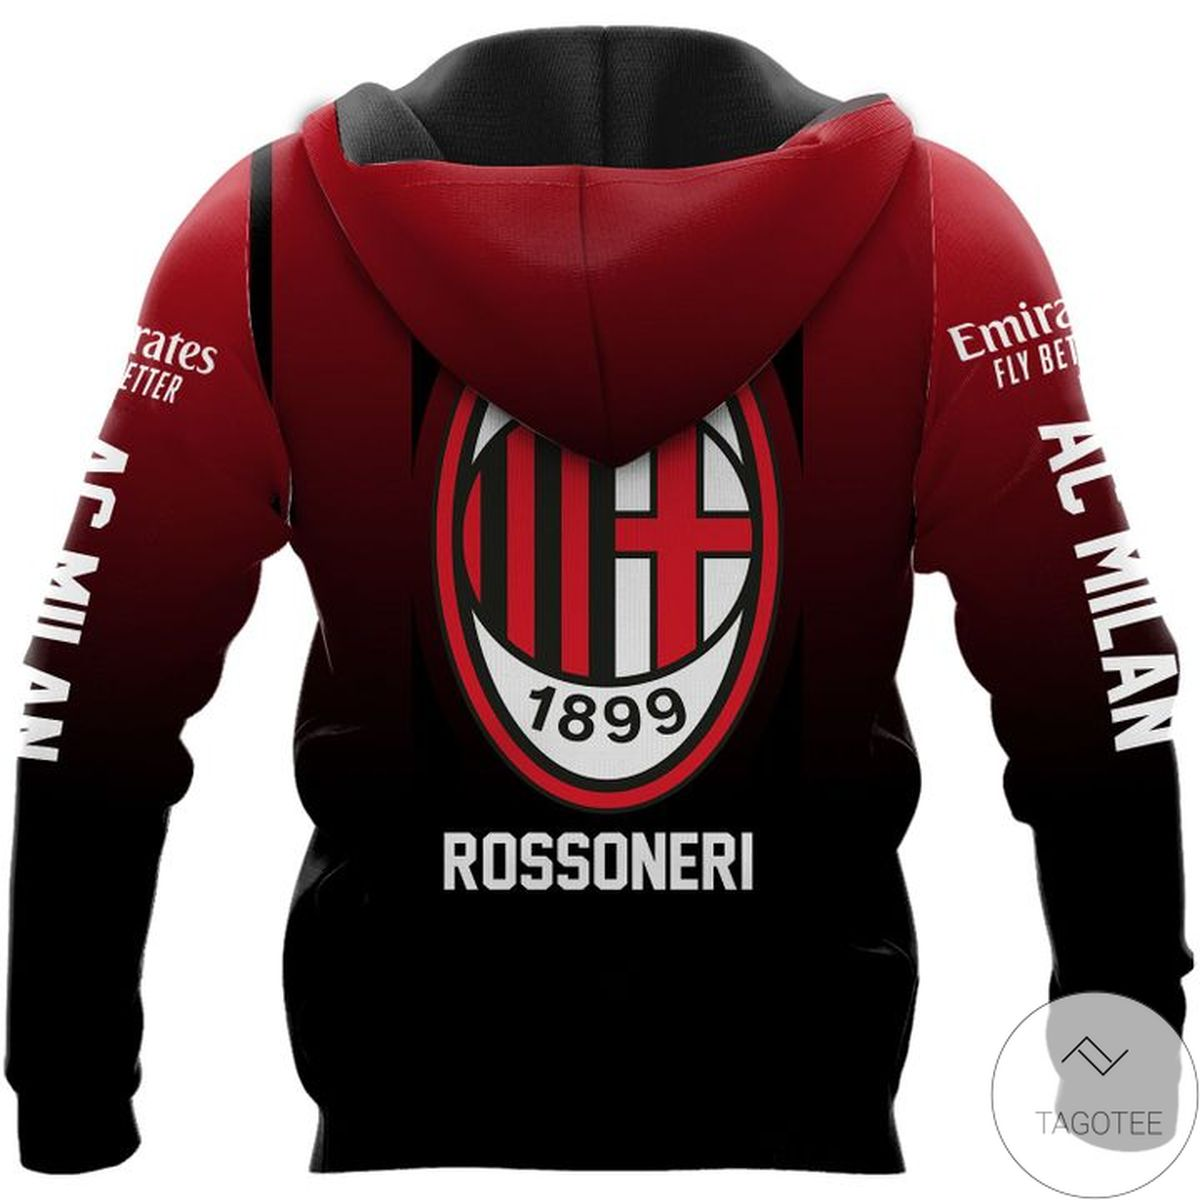 Ac Milan 1899 Rossoneri Hoodiez